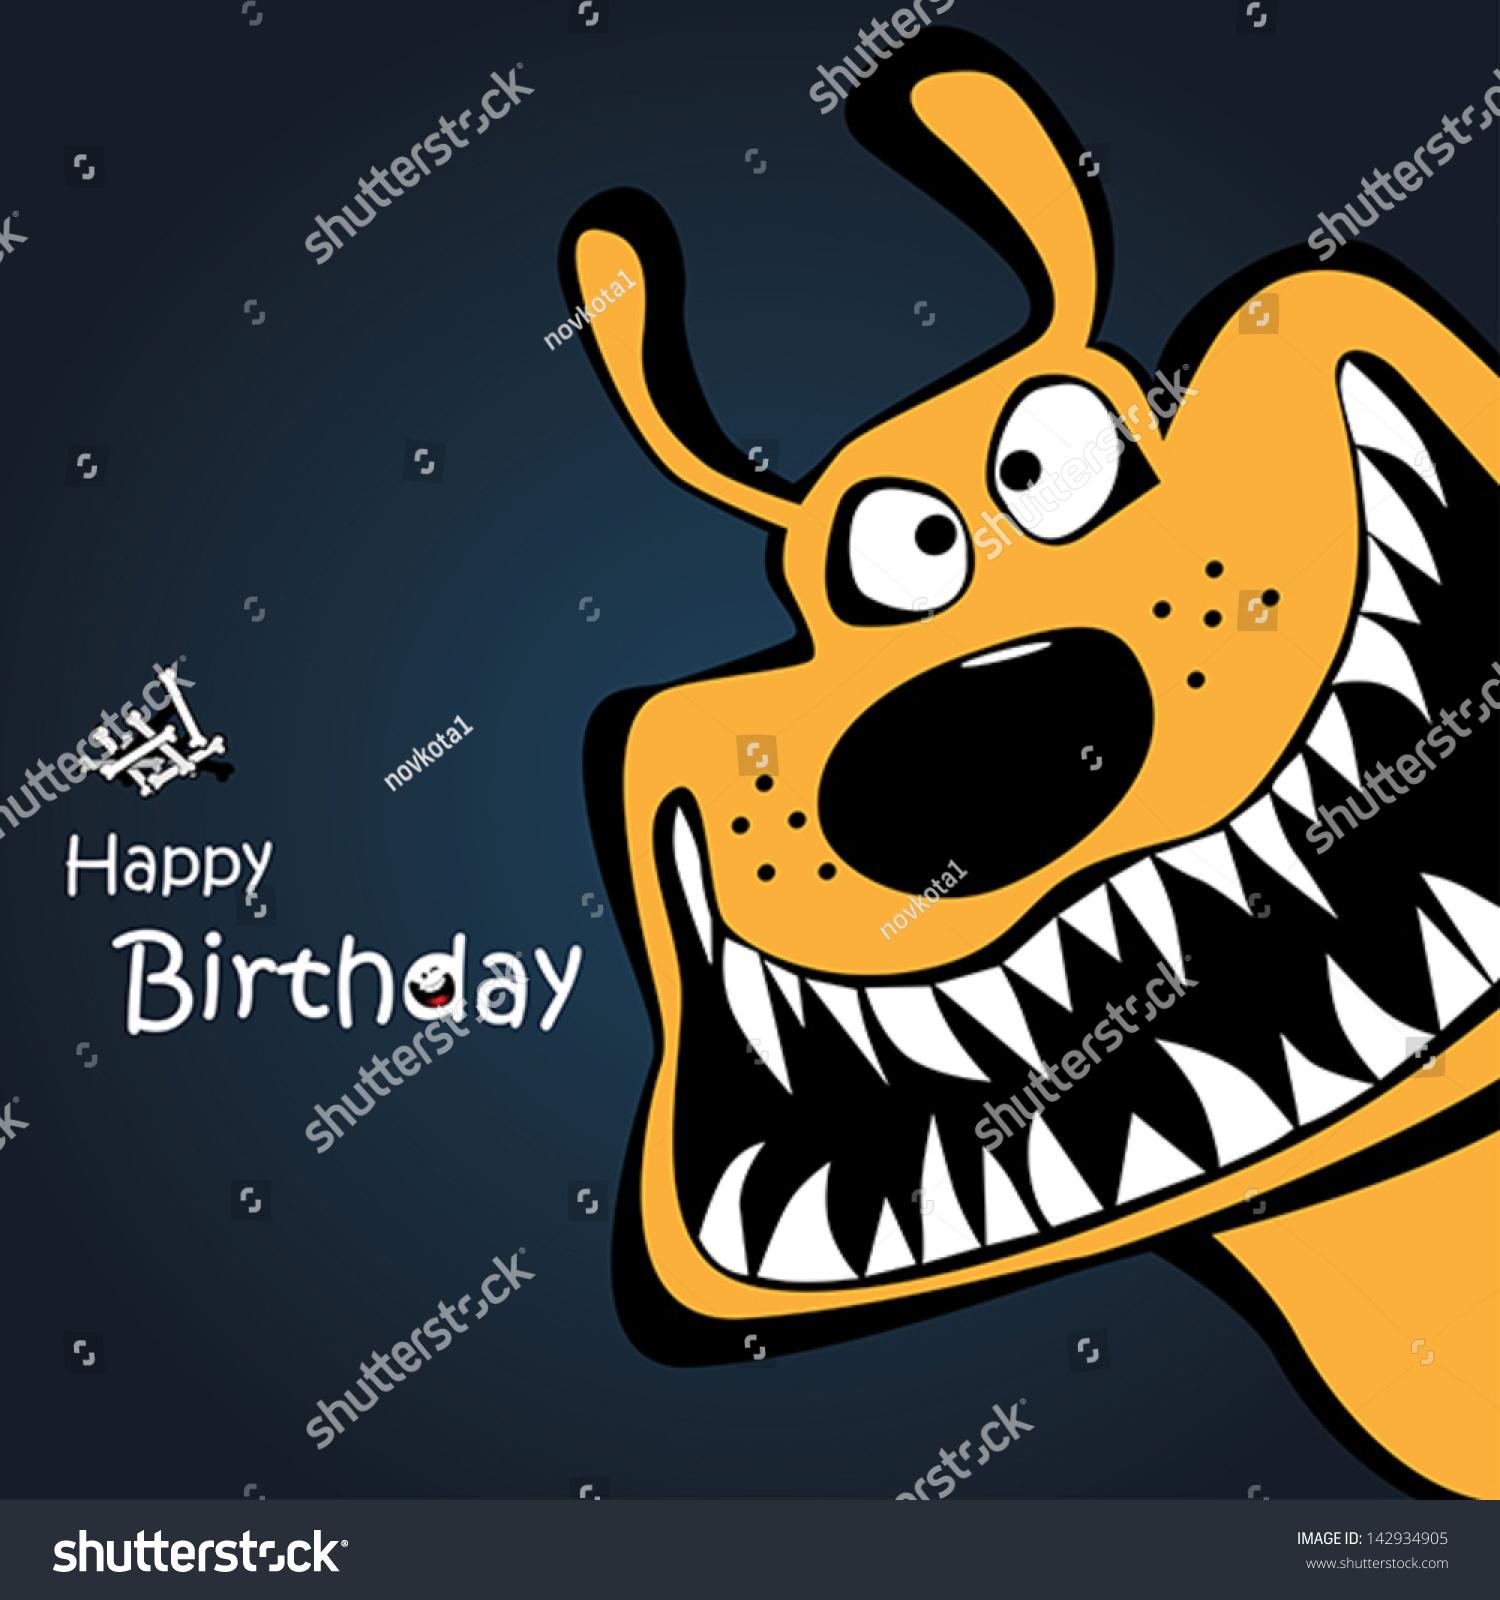 Happy Birthday Dog Card Vector 142934905 Shutterstock – Happy Birthday Dog Card